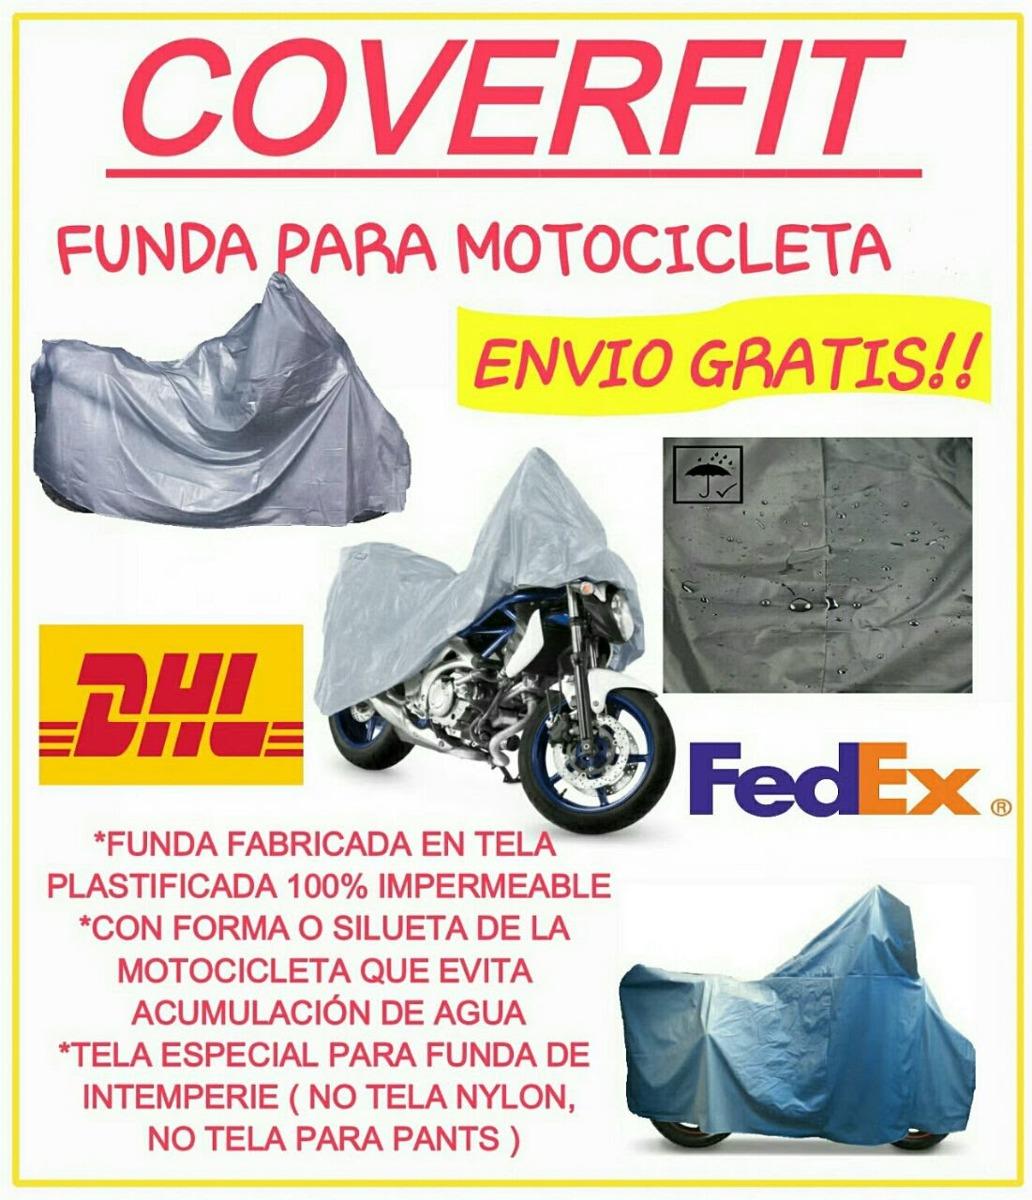 5fec9020e95 Funda Motocicleta Harley Davidson Bmw Ducati Xxl - $ 499.00 en ...